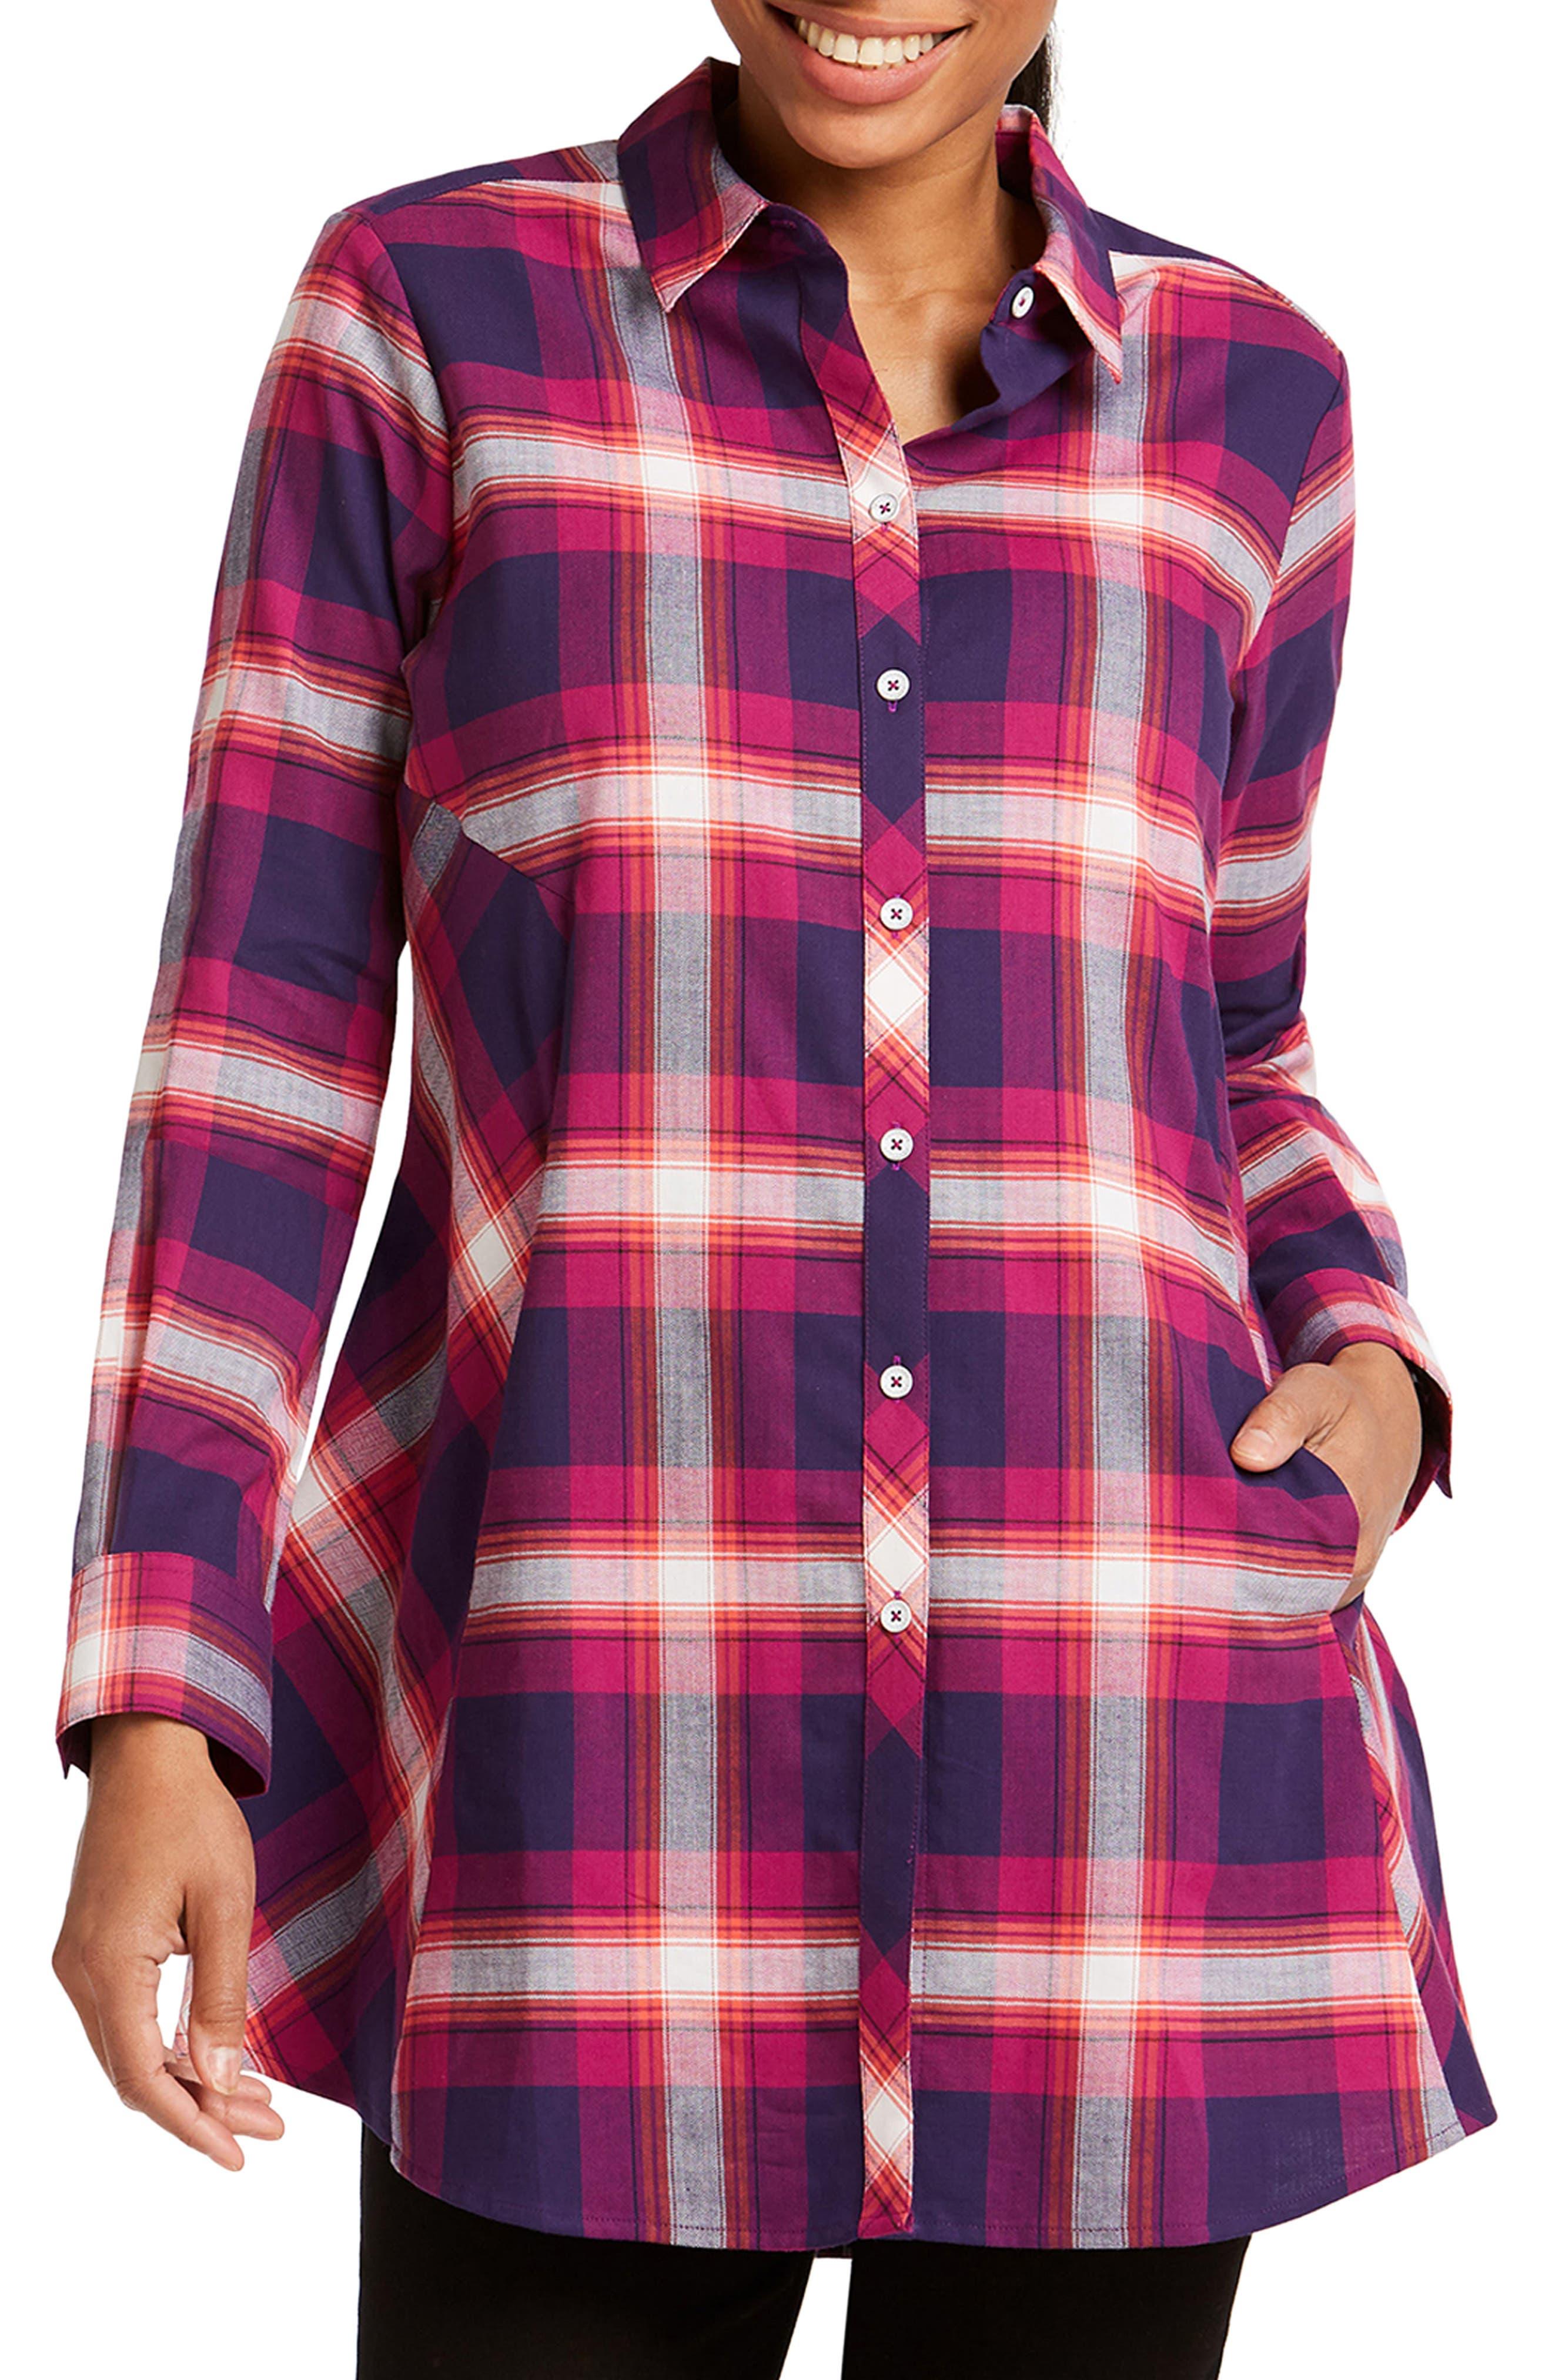 Cici Tartan Plaid Brushed Cotton Blend Tunic Top,                         Main,                         color, 001